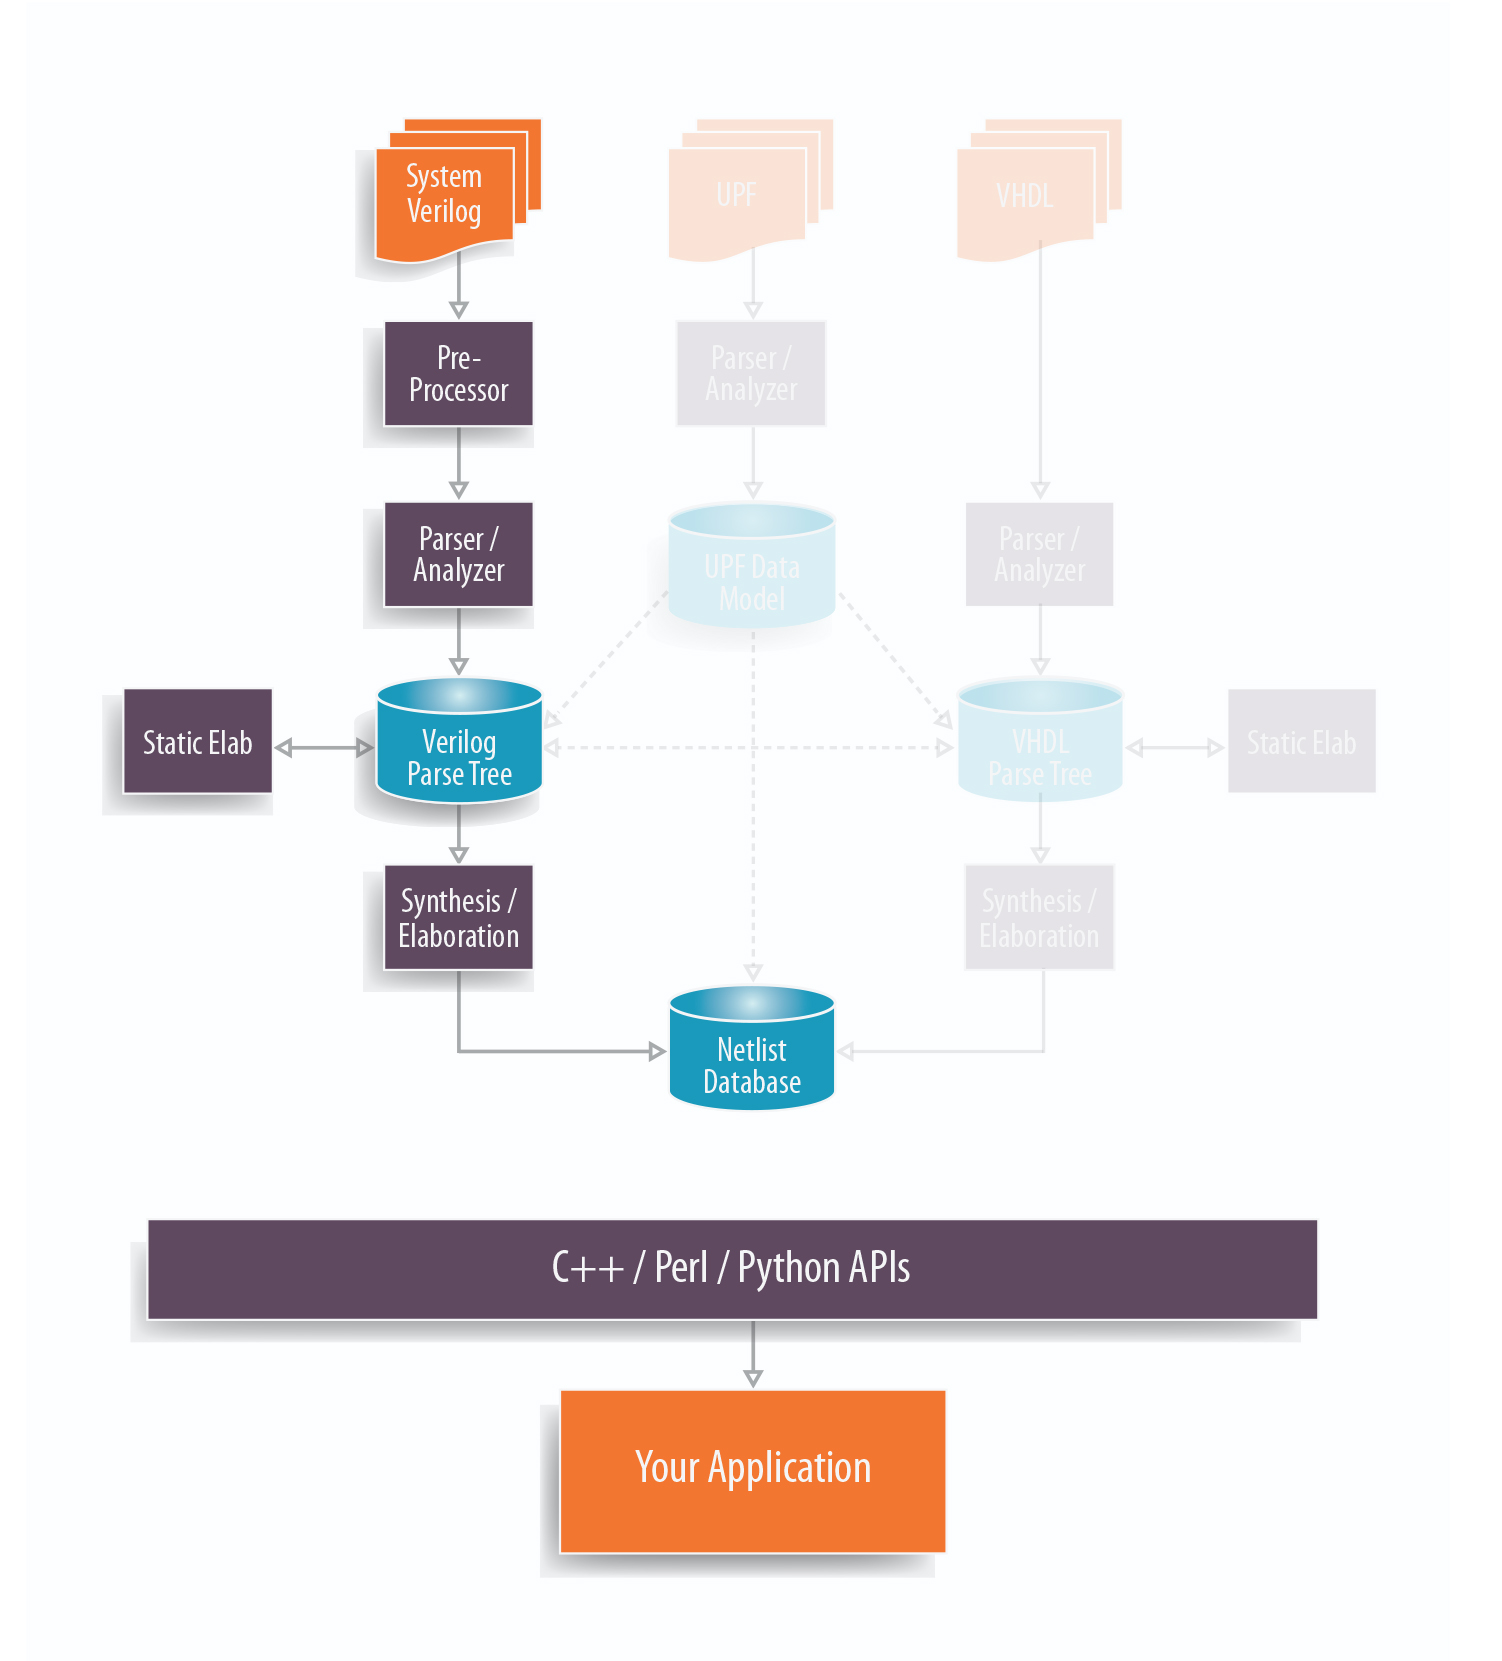 SystemVerilog with white background